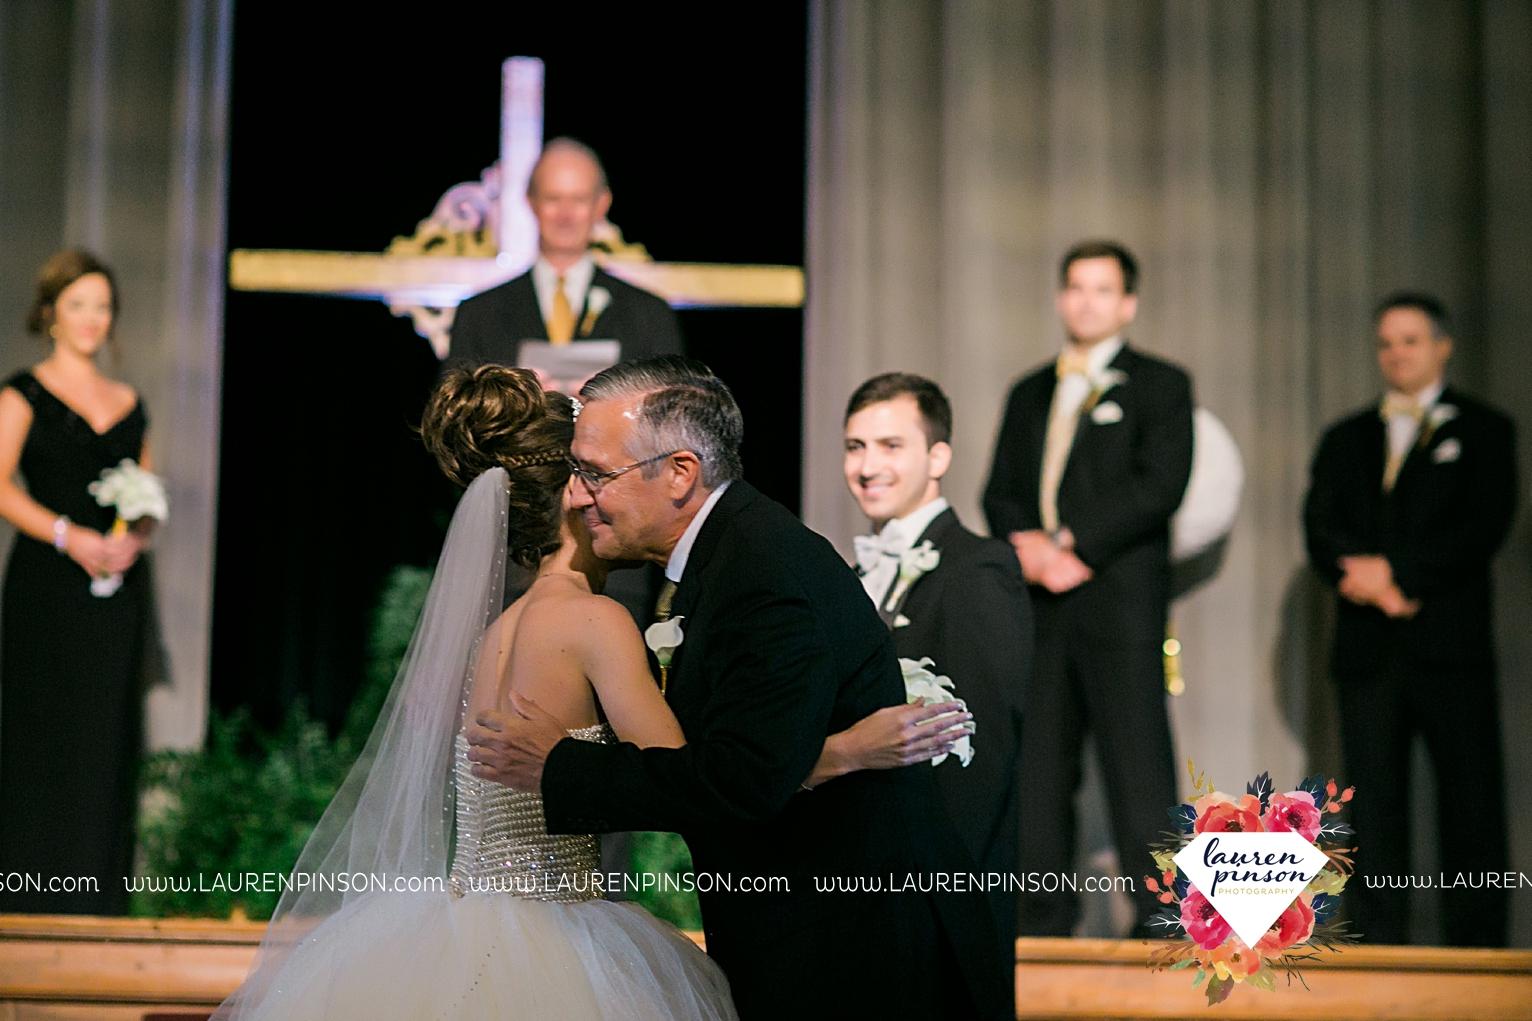 wichita-falls-texas-wedding-photographer-the-forum-by-the-kemp-mayfield-events-ulta-gold-glitter_2864.jpg